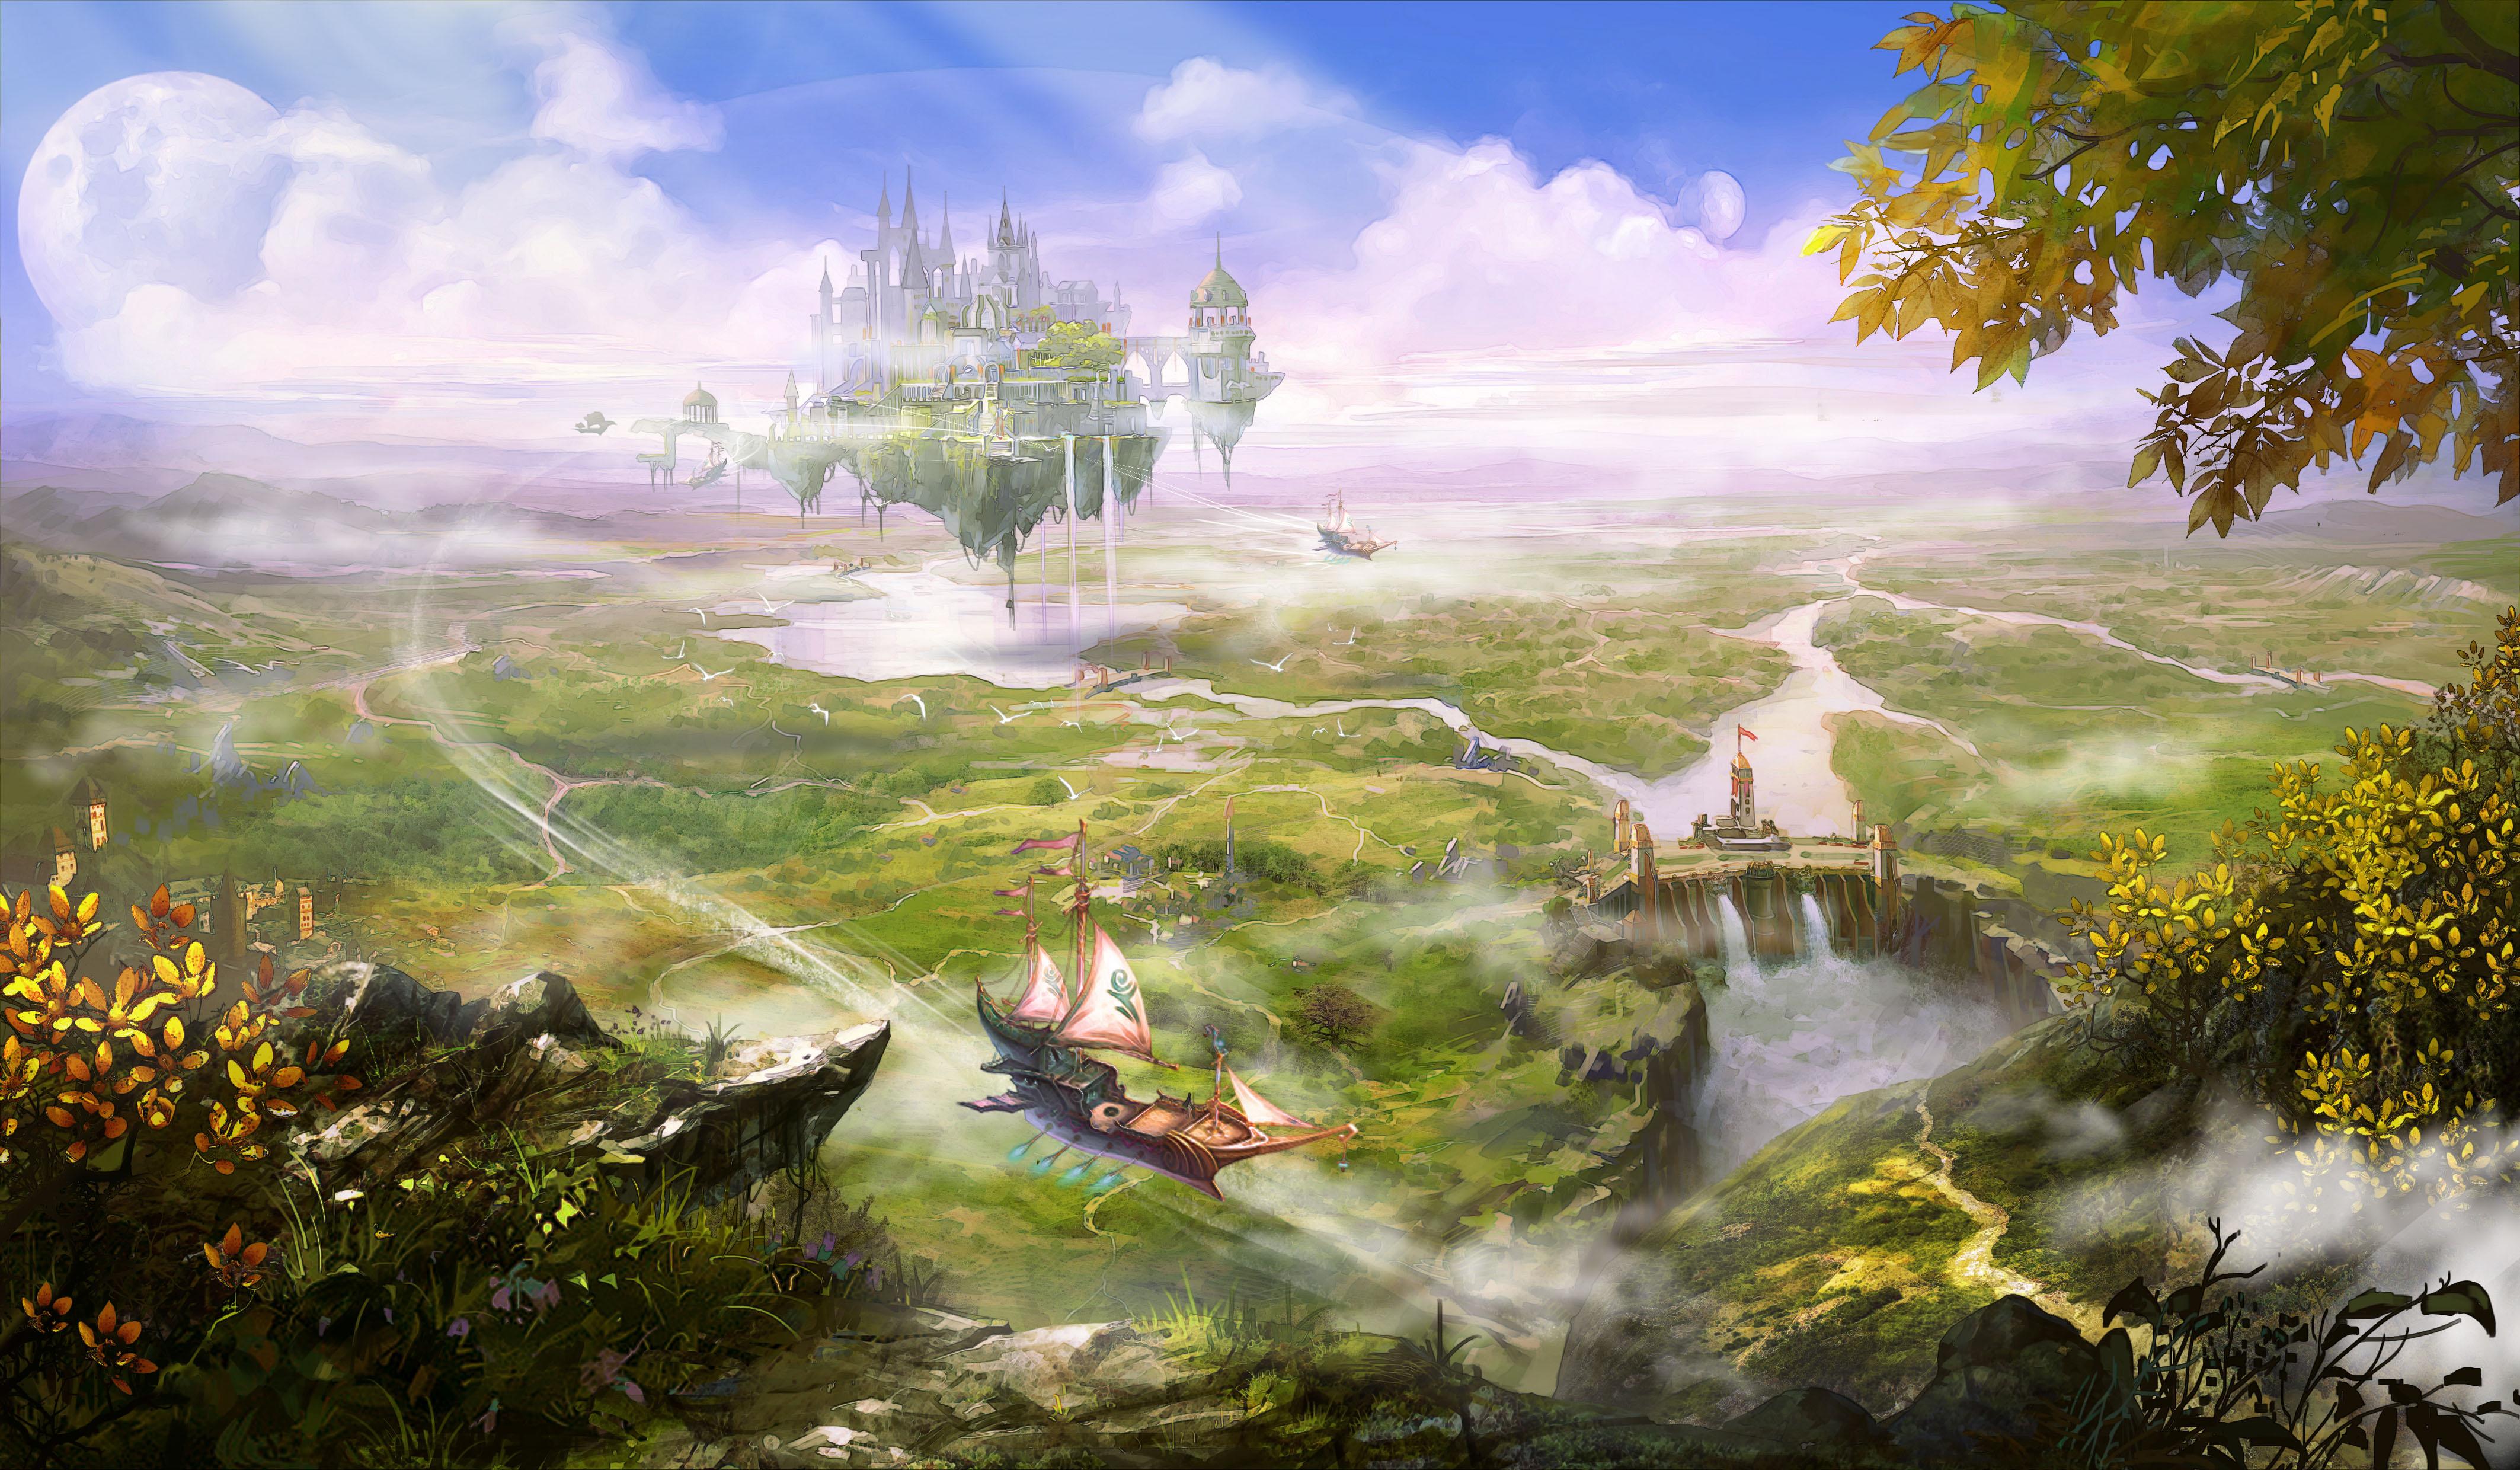 Fantasy Scenery Nature 4252x2480 Wallpaper Teahub Io